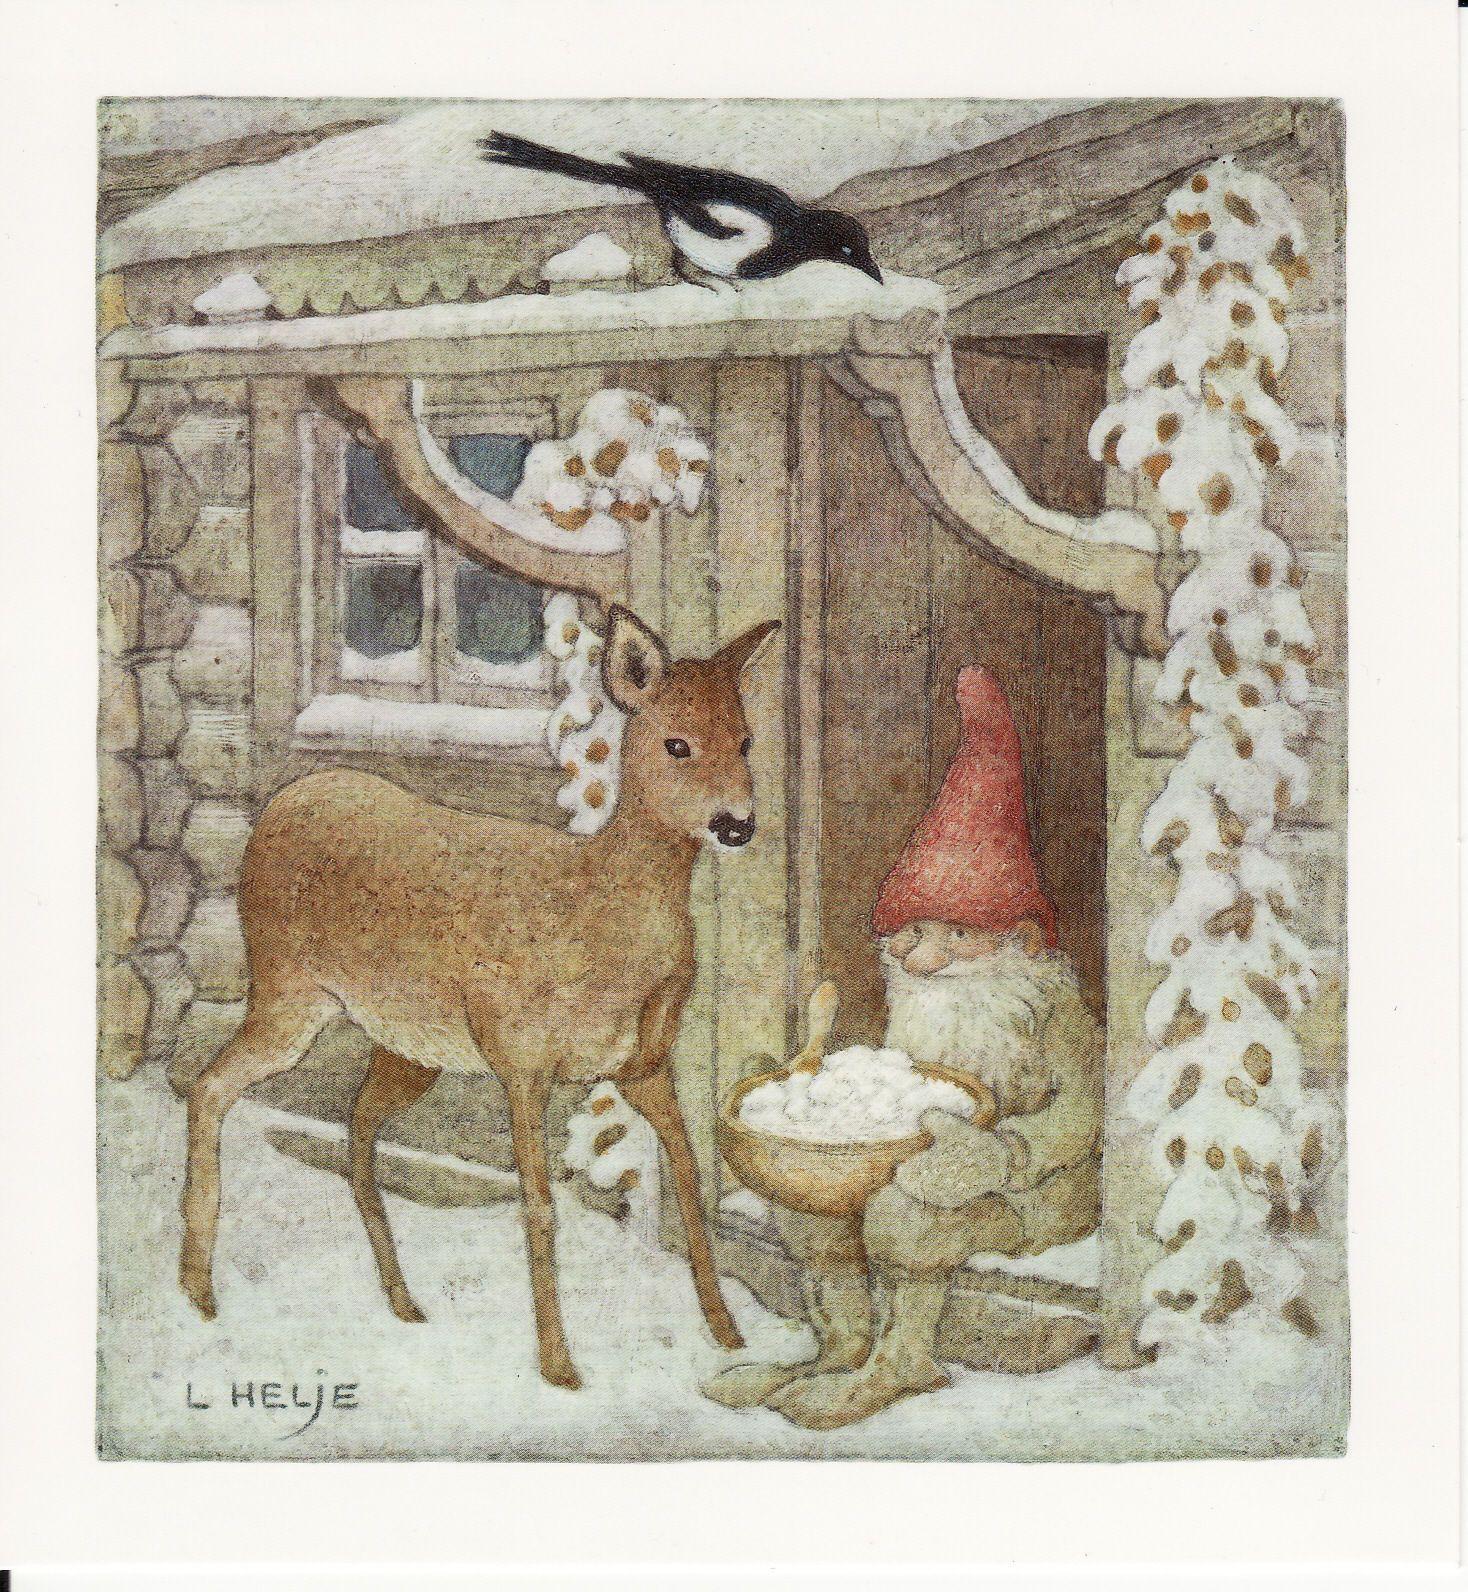 New Single Postcard by Lennart Helje Gnome Bird House Roe Deer | eBay